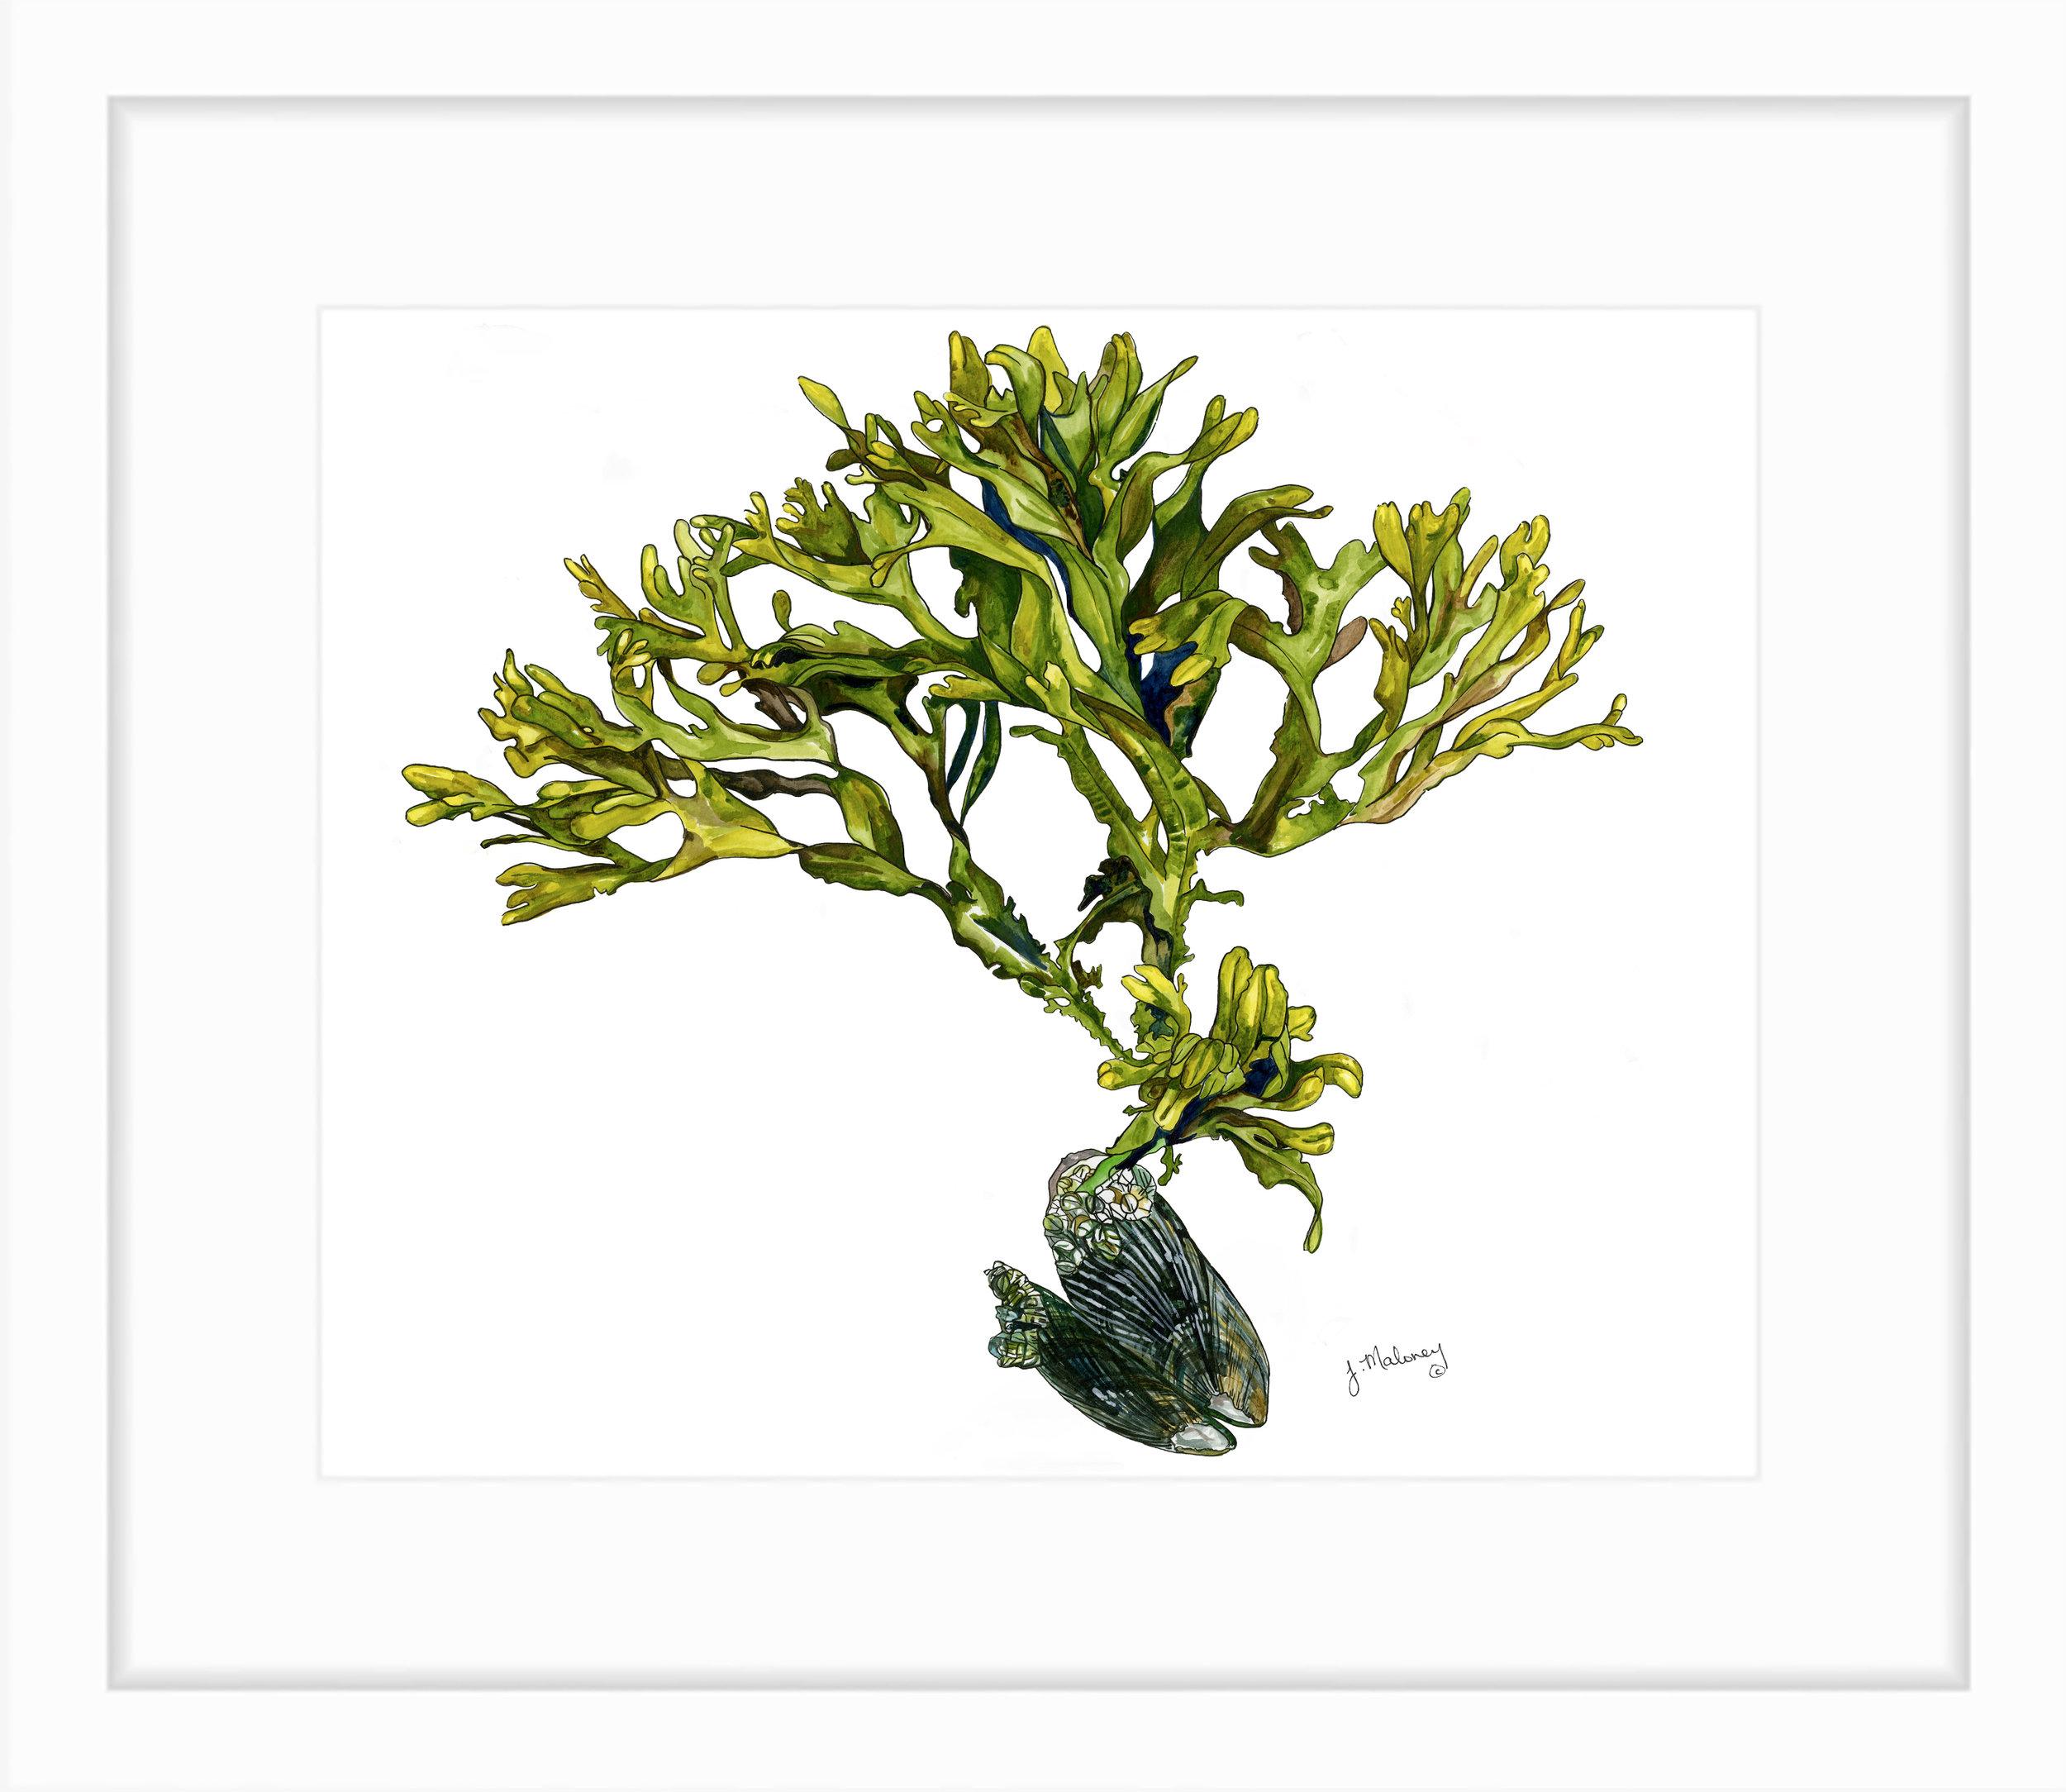 Seaweed_JMaloney.jpg